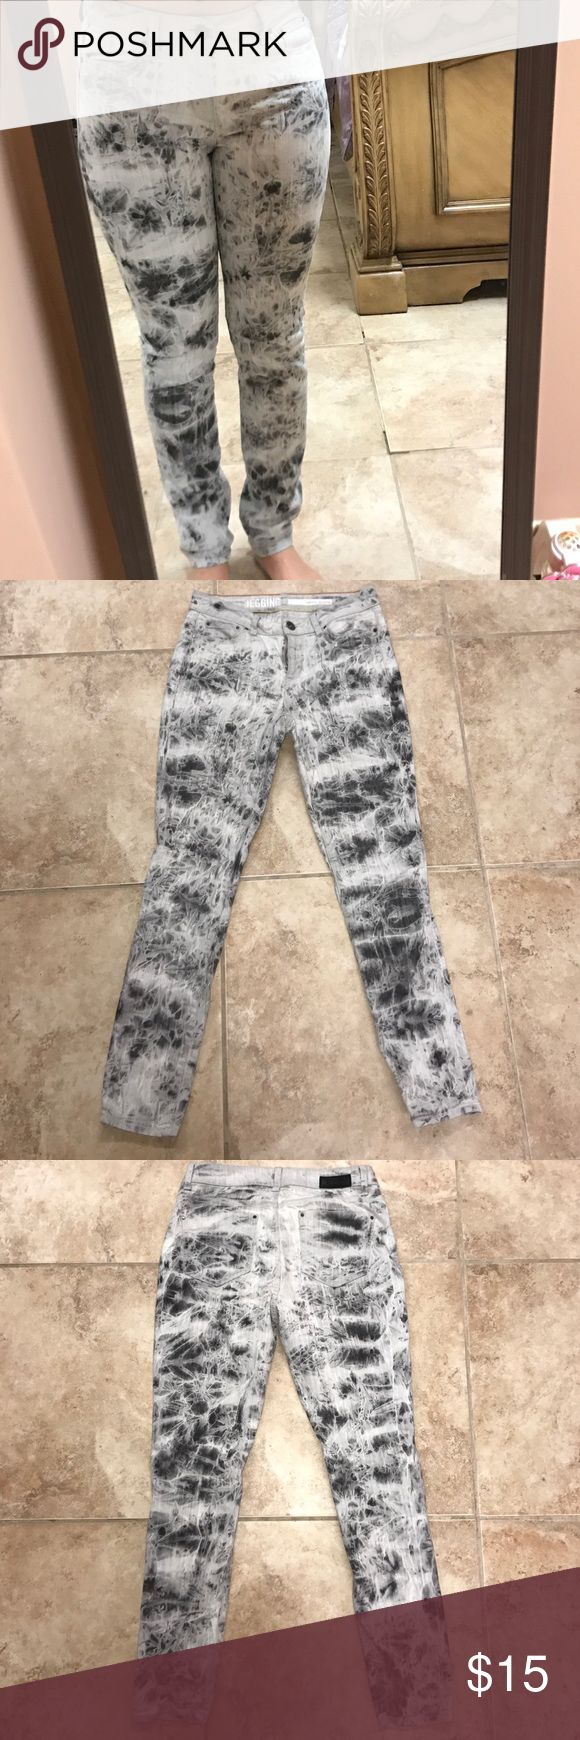 DKNY acid wash jeans DKNY acid wash jeans DKNY Jeans Straight Leg